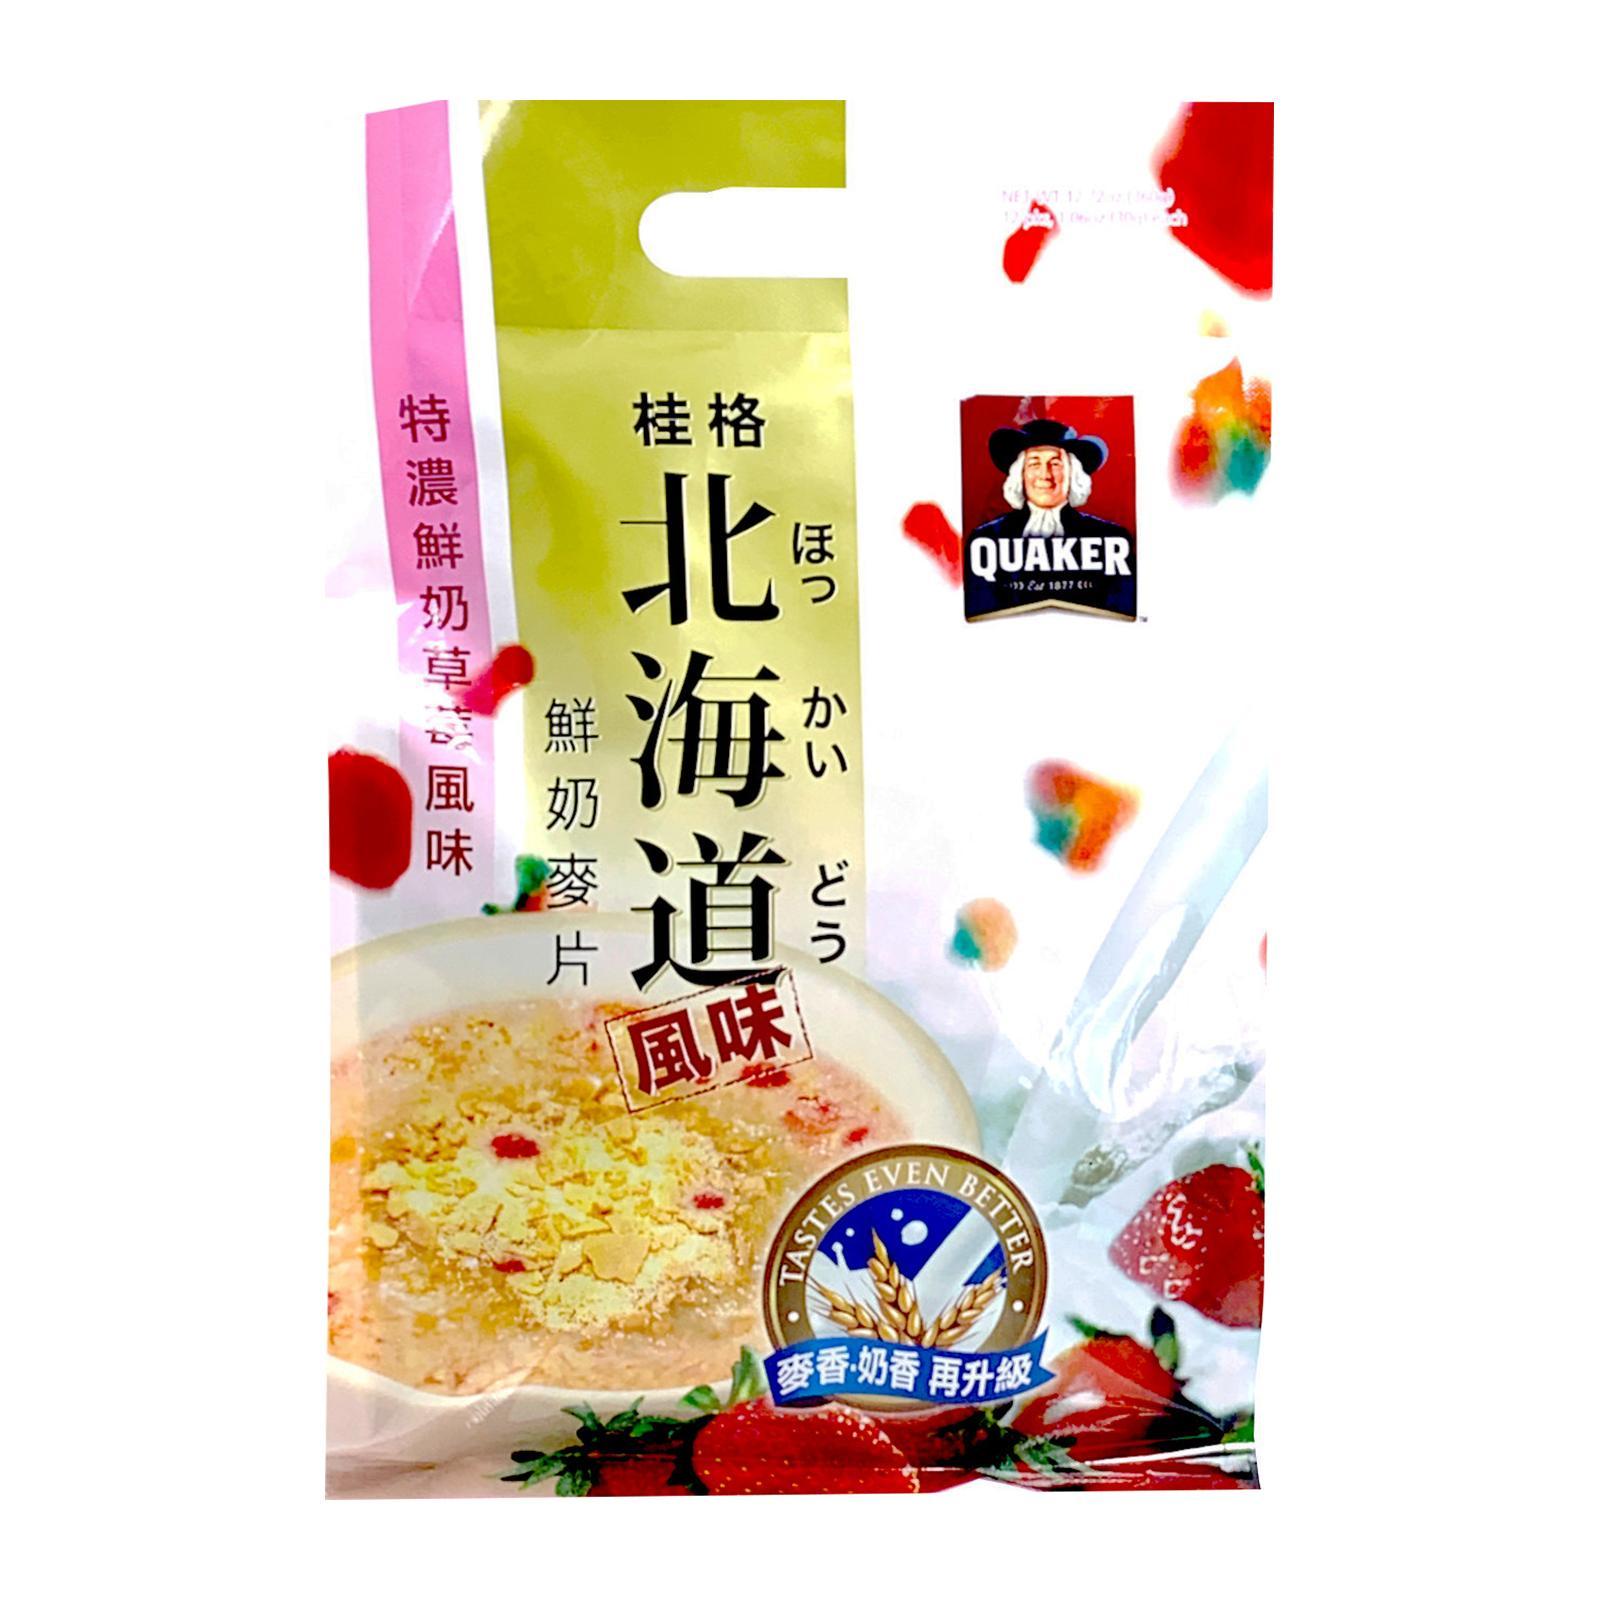 QUAKER Hokkaido Strawberry Oatmeal Instant Beverage